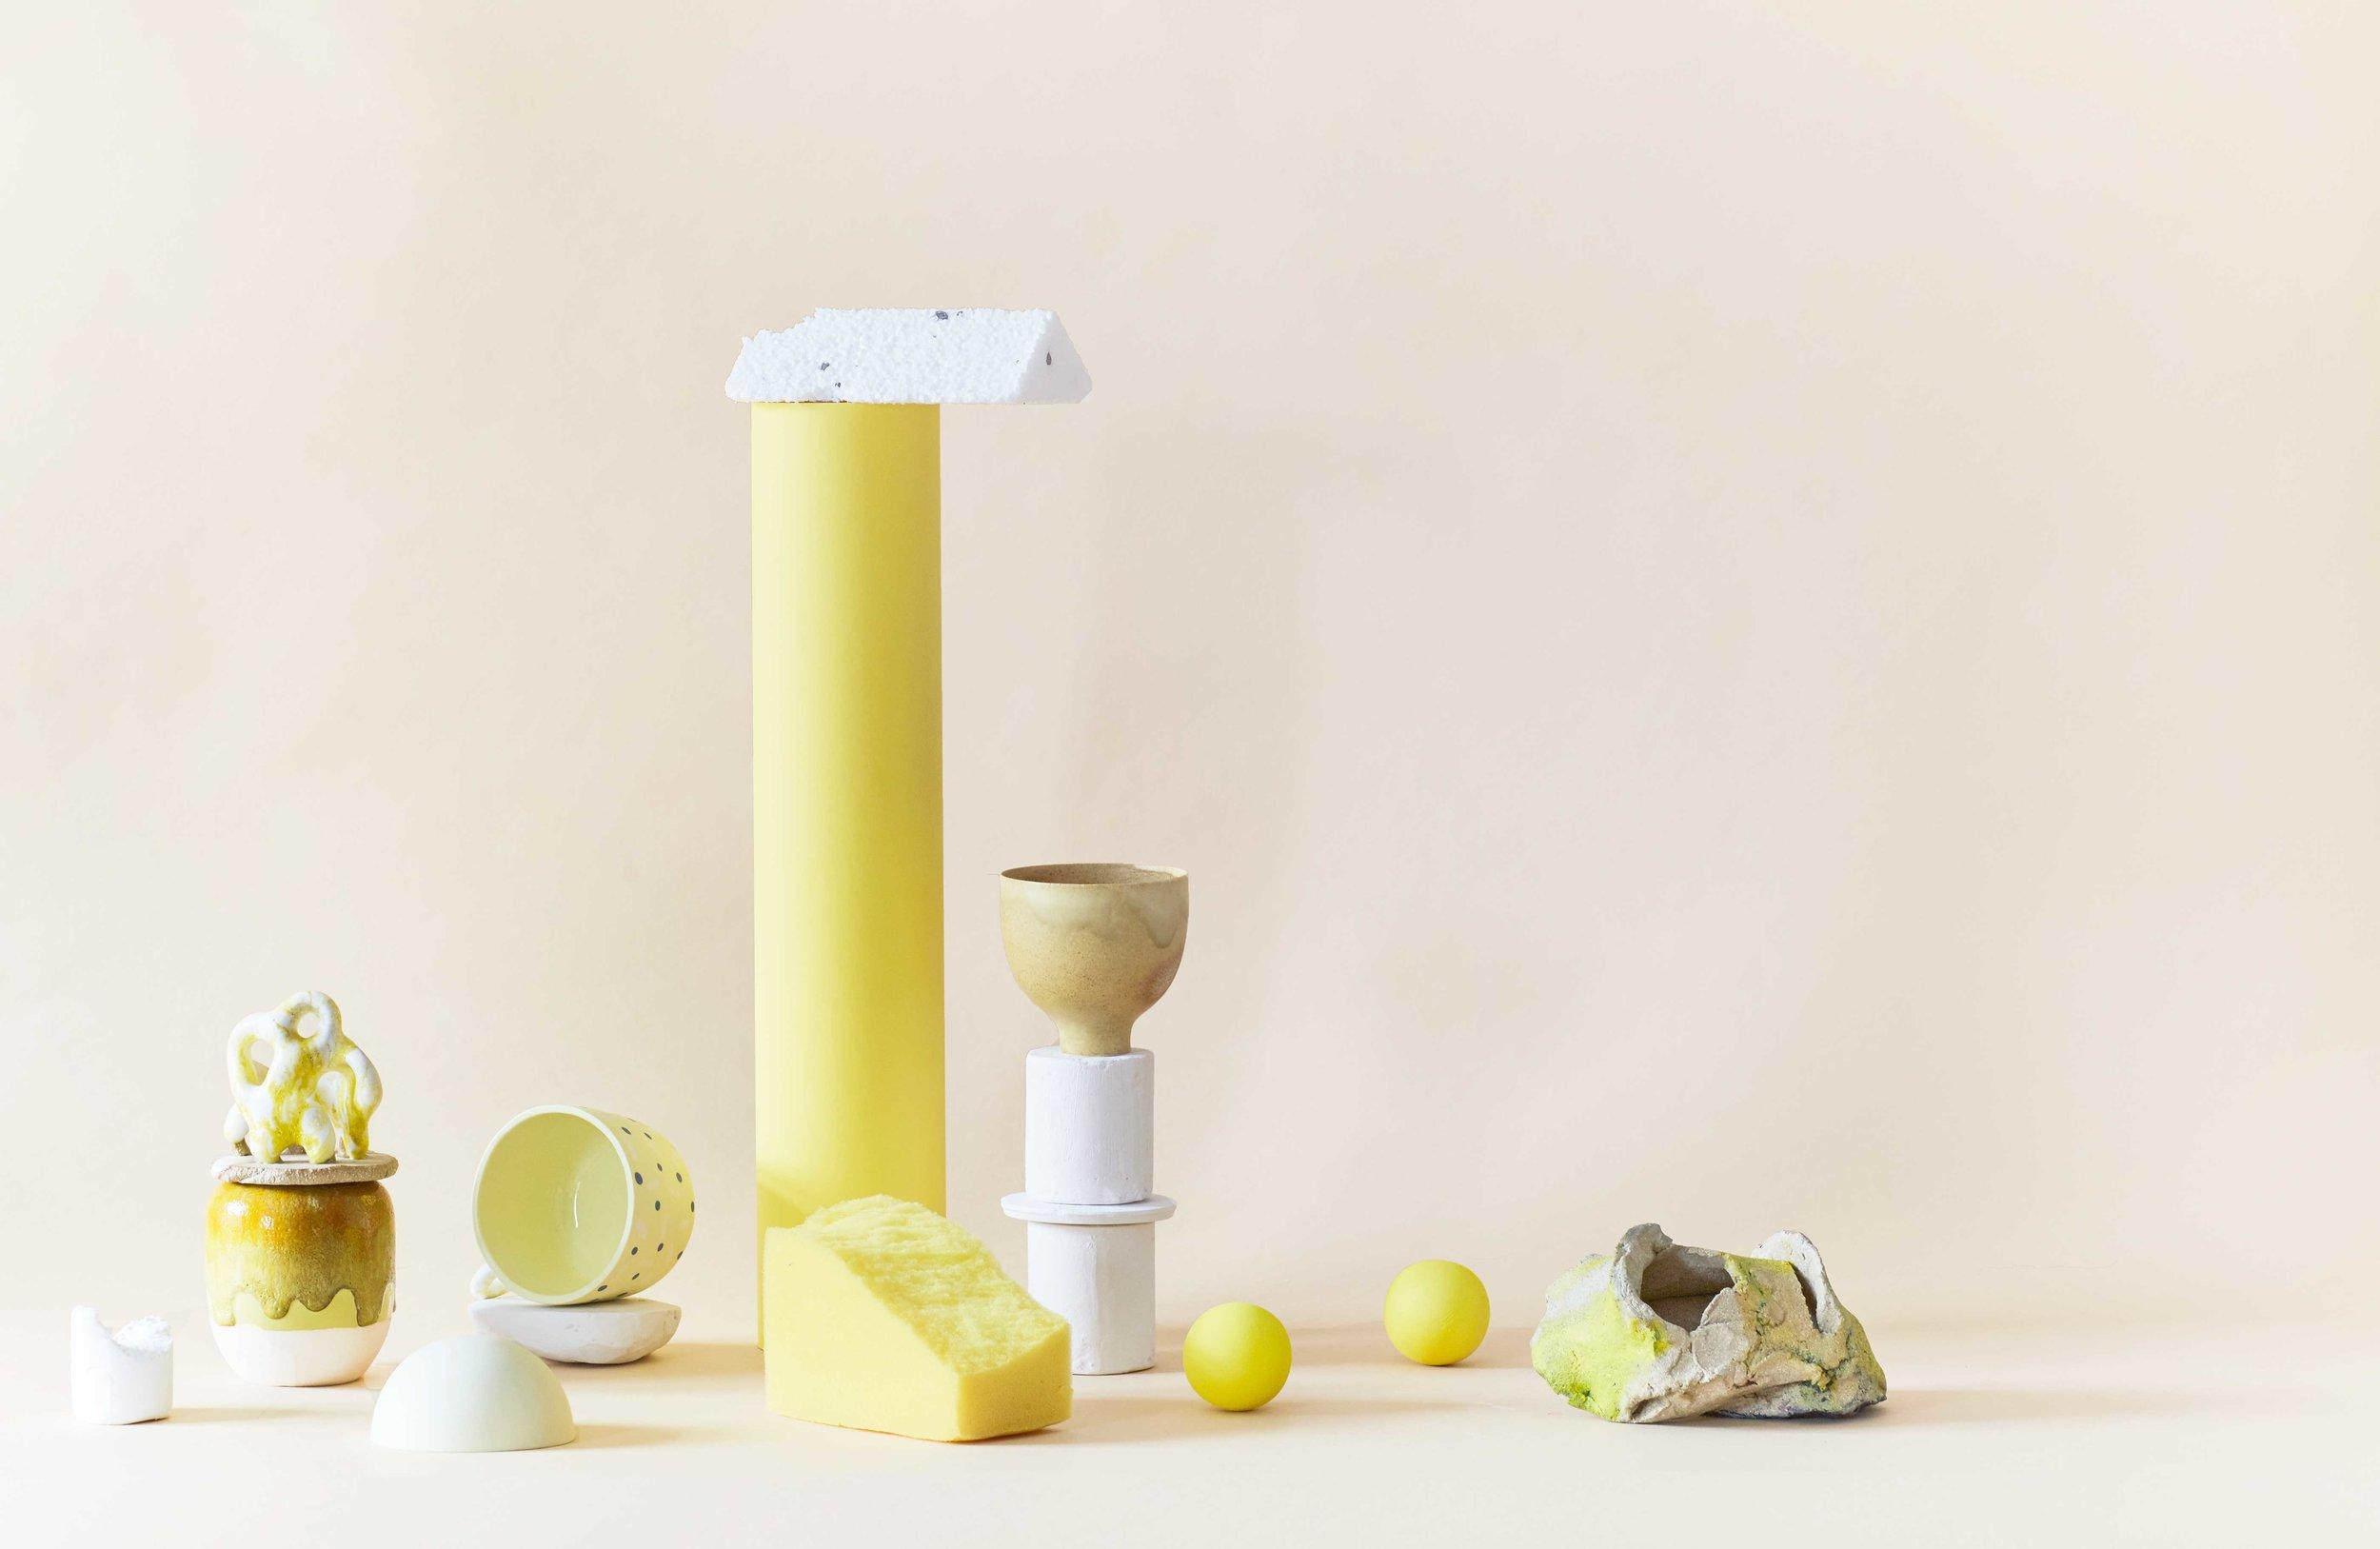 //yellow    Sculpture Bente Skjoettgaard / Vase Arhøj / Cup Yonobi Studio / Cup Stilleben / Sculpture Inge-Lise Koefoed